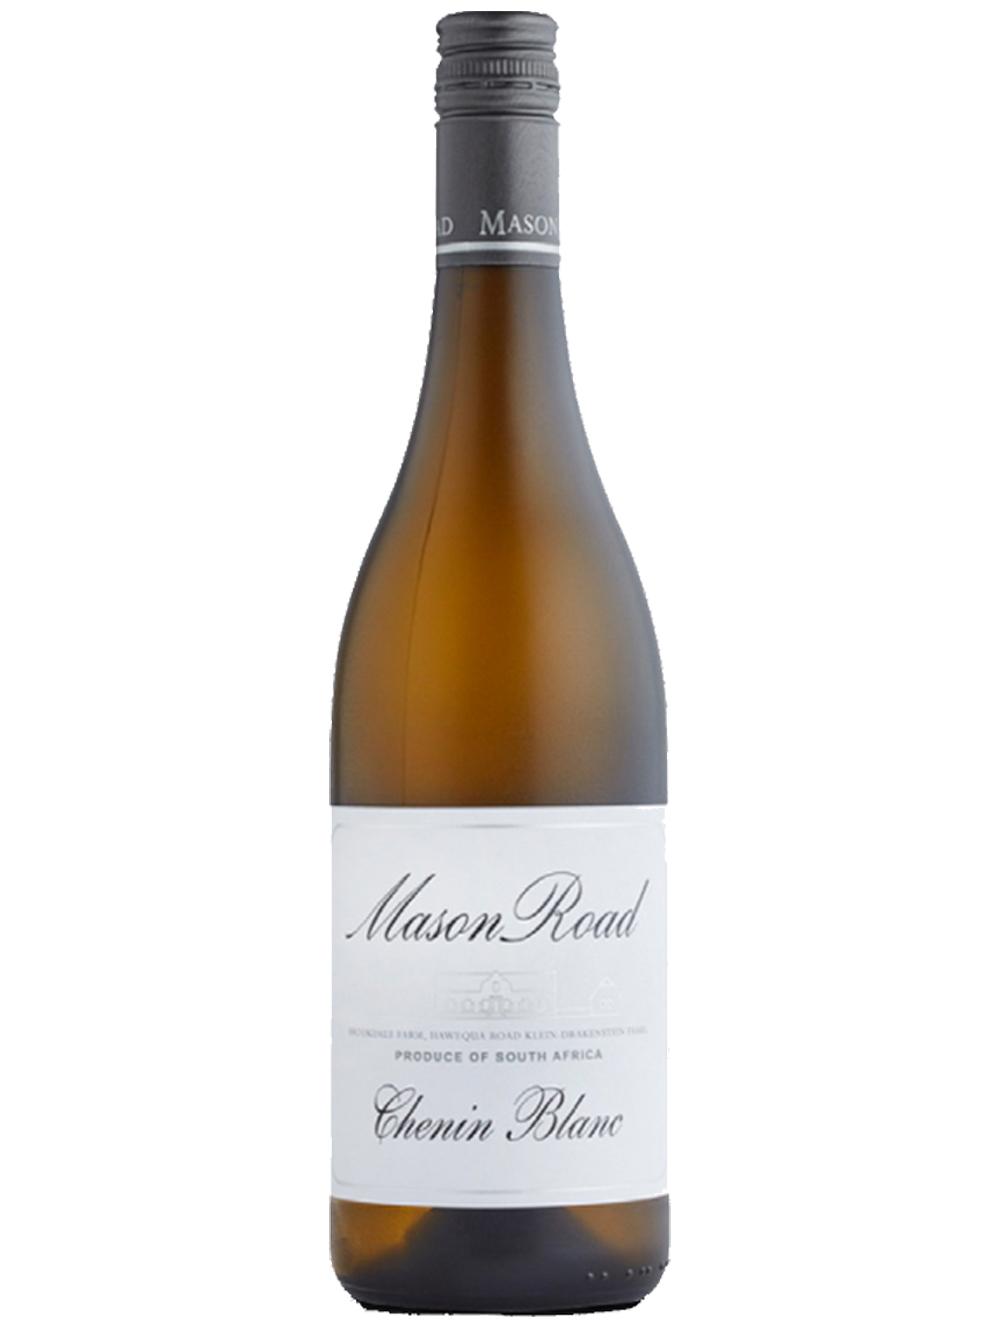 2019 Brookdale Mason Road Chenin Blanc